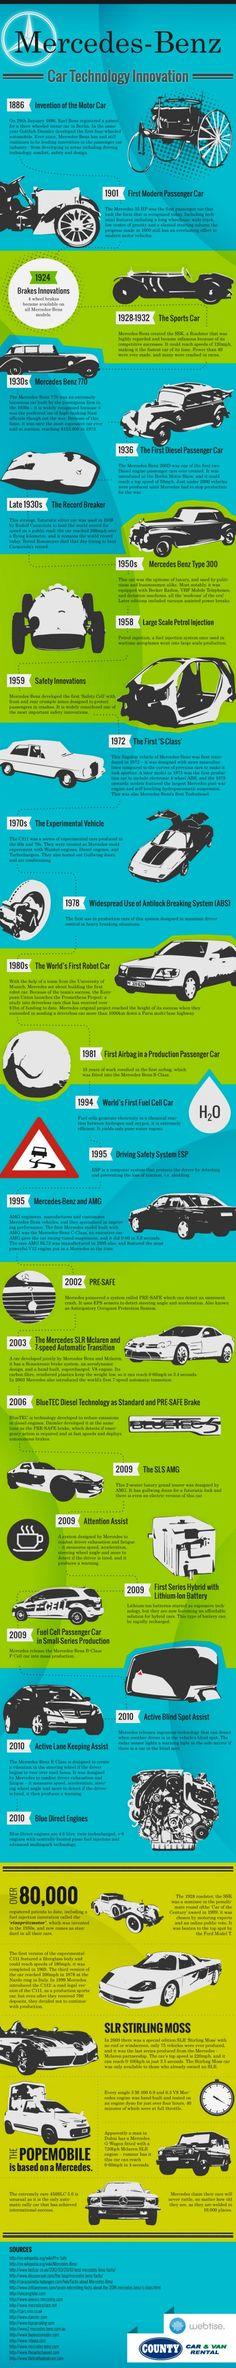 Mercedes-Benz - Car Technology Innovation Infographic